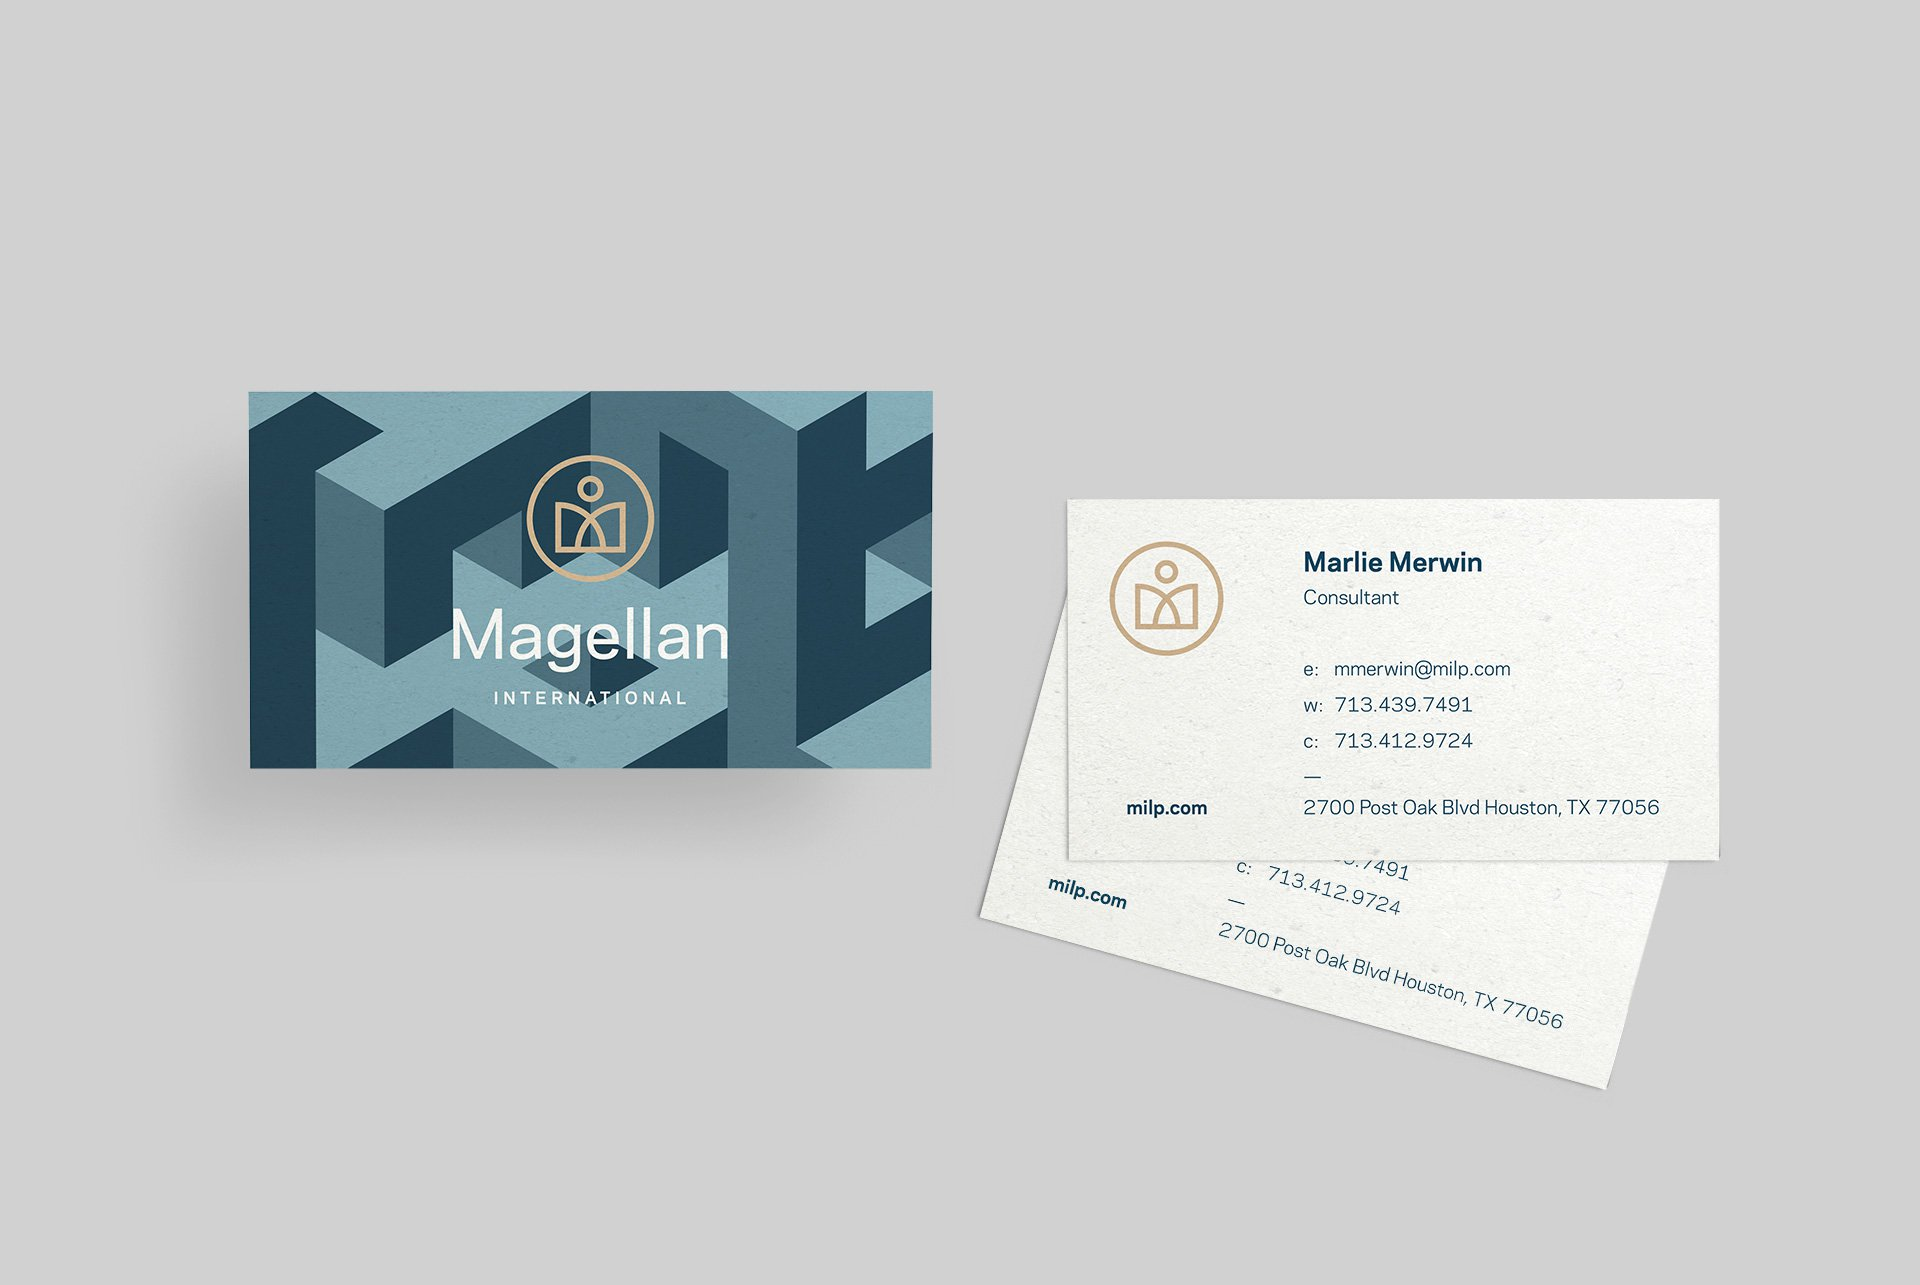 Magellan International Business Card Designs